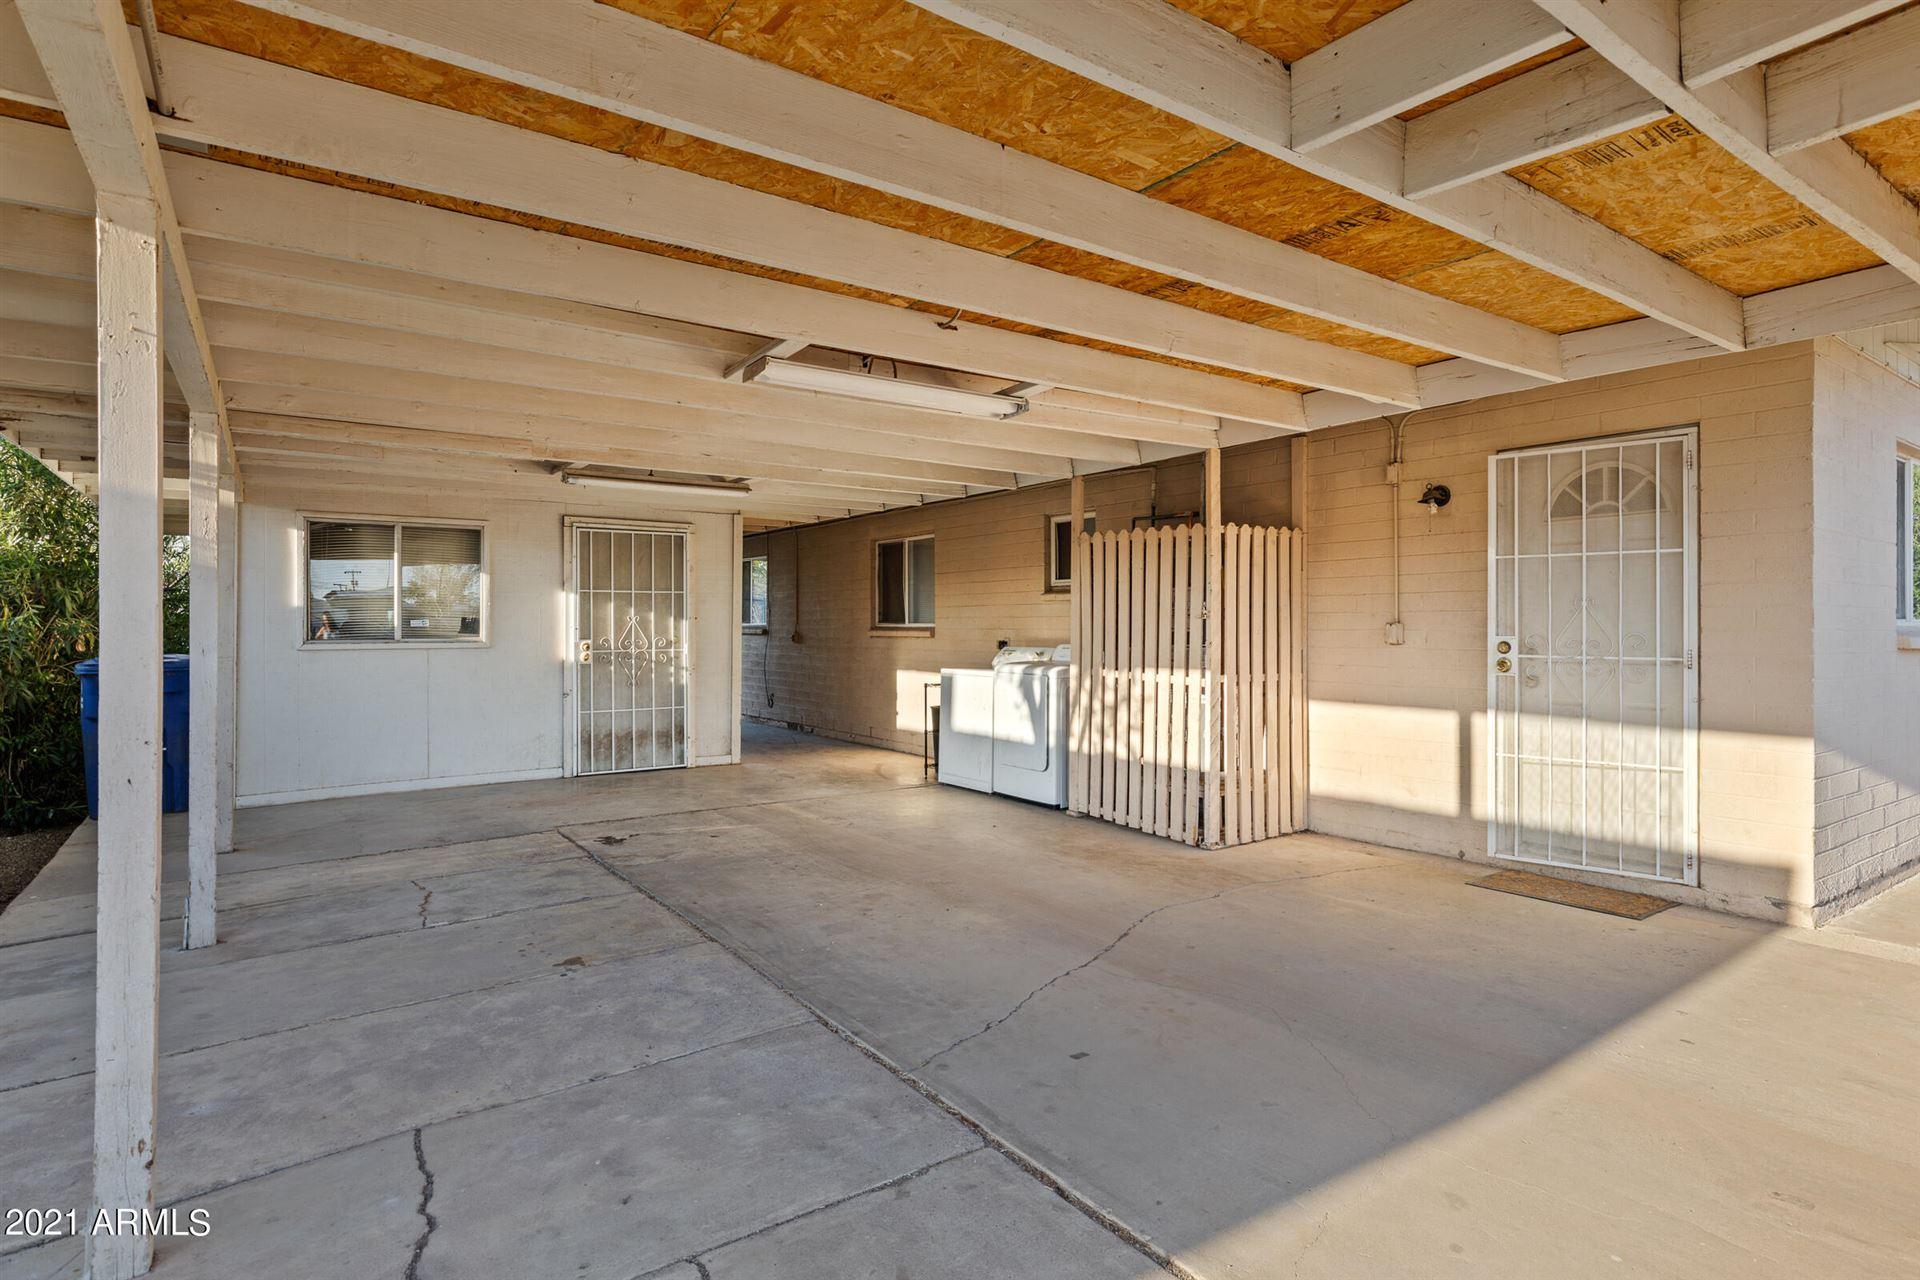 Photo of 2112 E LEMON Street, Tempe, AZ 85281 (MLS # 6292585)